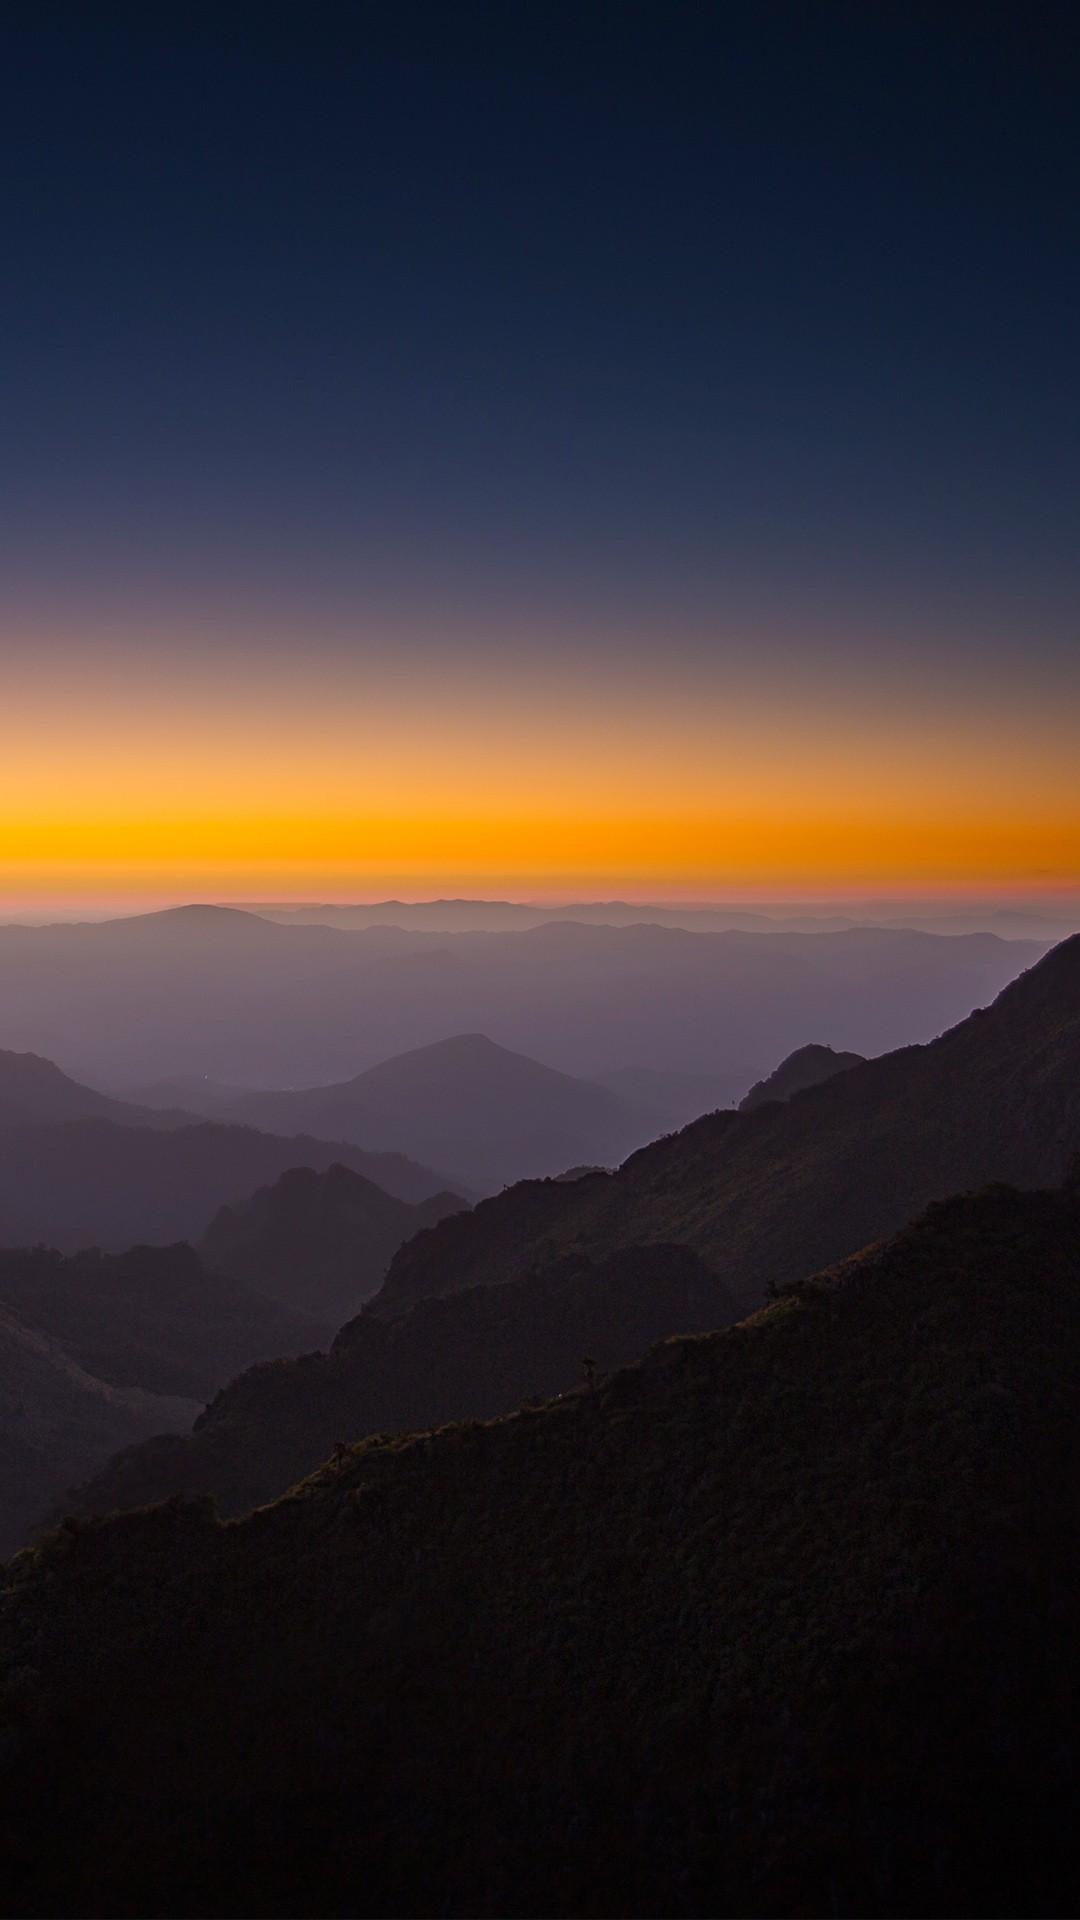 Apple Iphone Wallpaper Hd Download Horizon Sunset Mountains 4k Wallpapers Hd Wallpapers